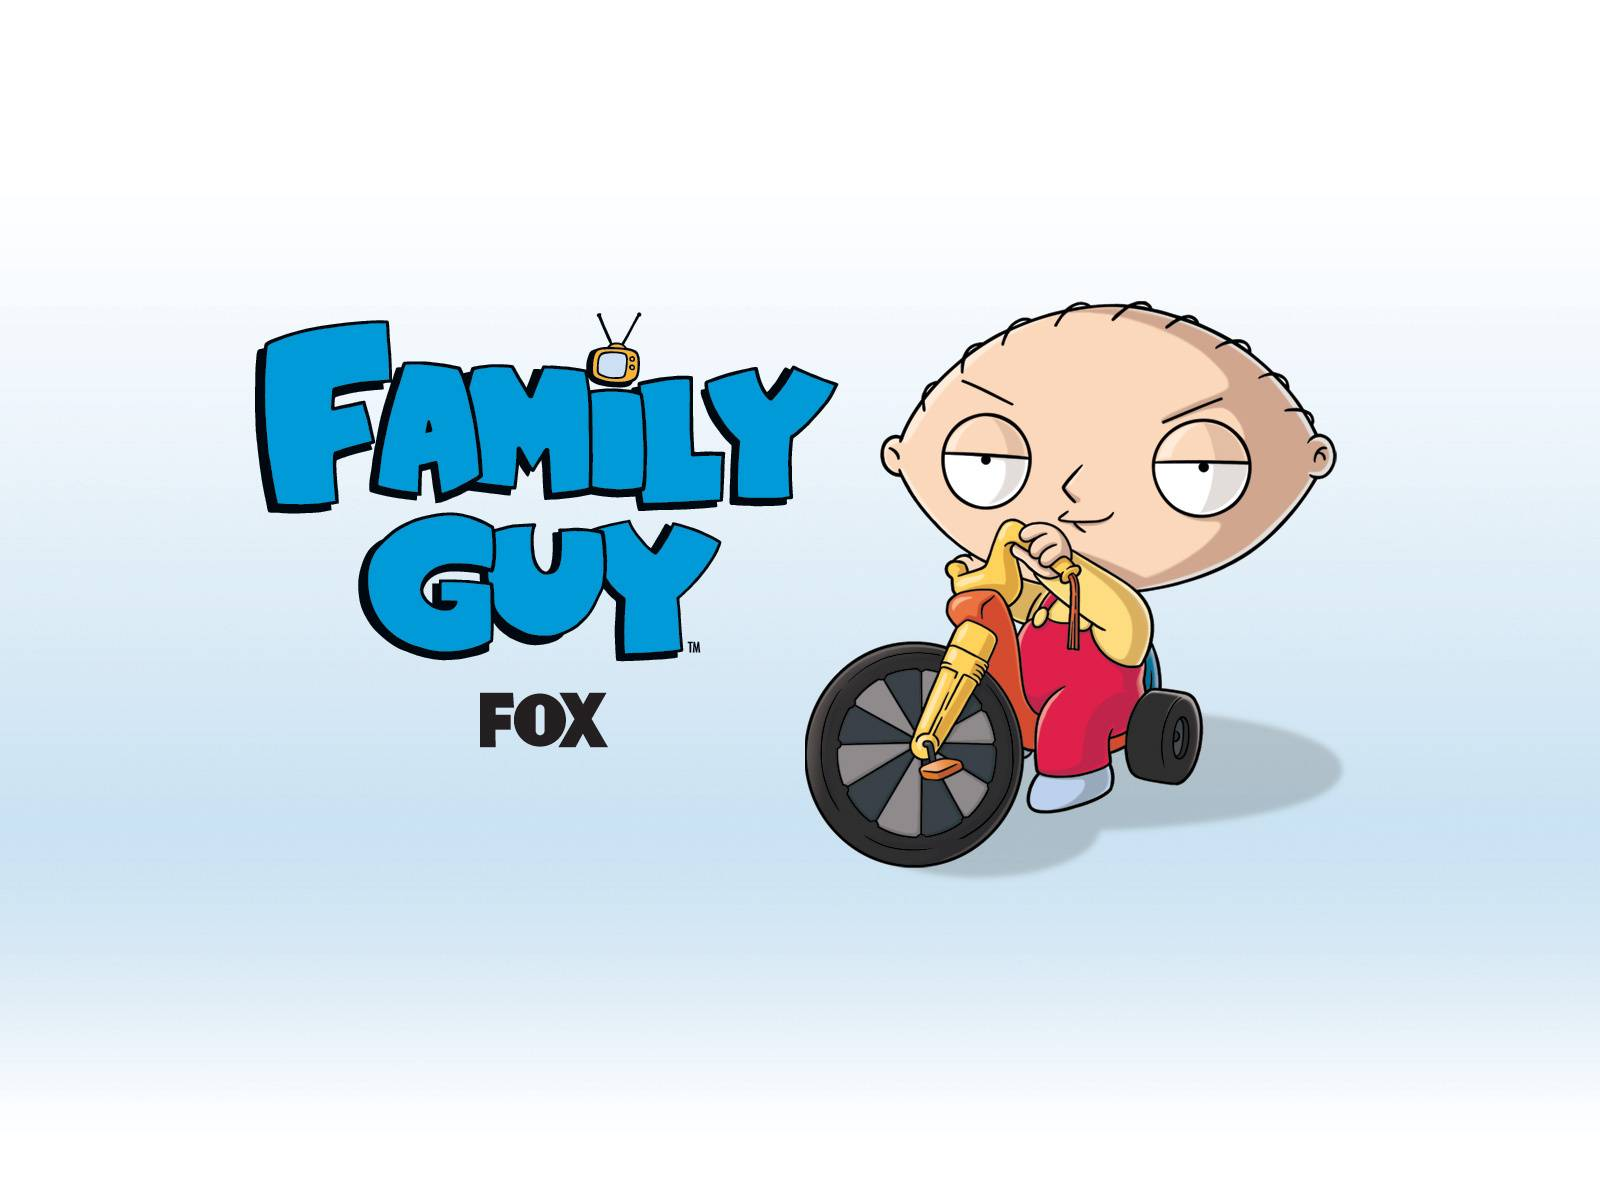 Stewie Wallpaper   Family Guy Wallpaper 1600x1200